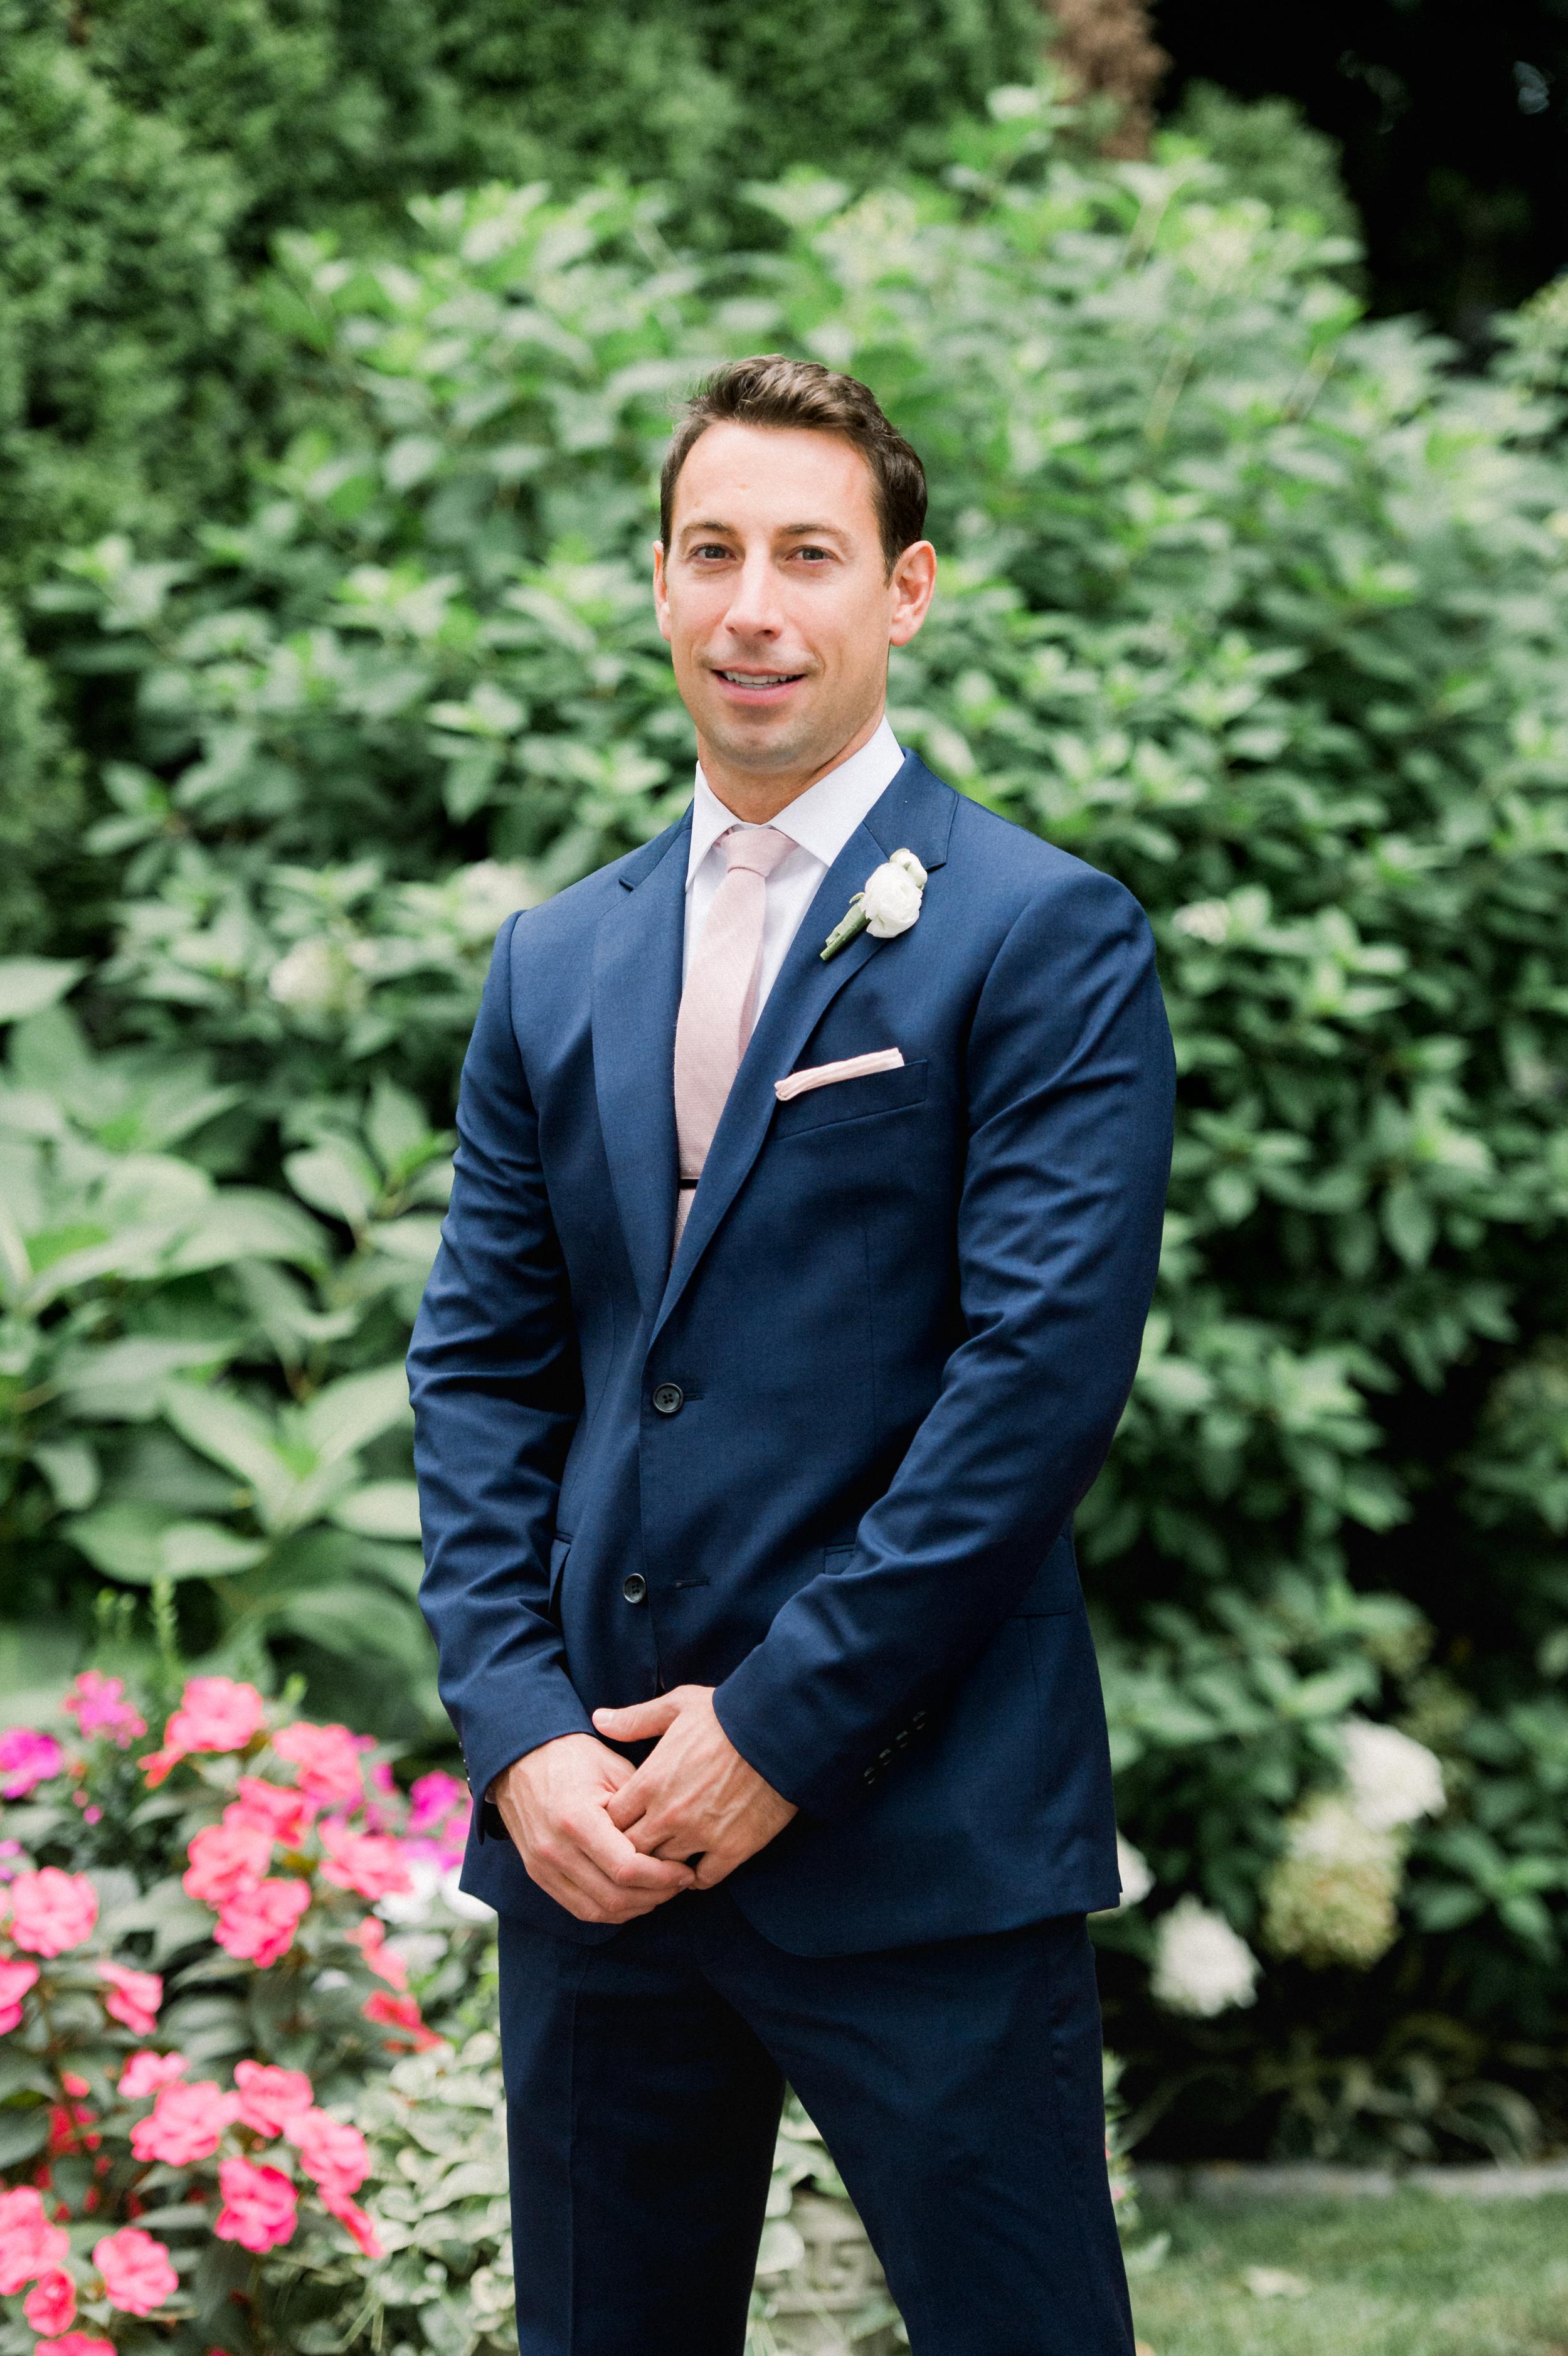 The Commons 1854 Topsfield MA wedding | Massachusetts wedding venue | Massachusetts wedding photography | North Shore MA Wedding photos | groom portraits | MA groom photos | groom style